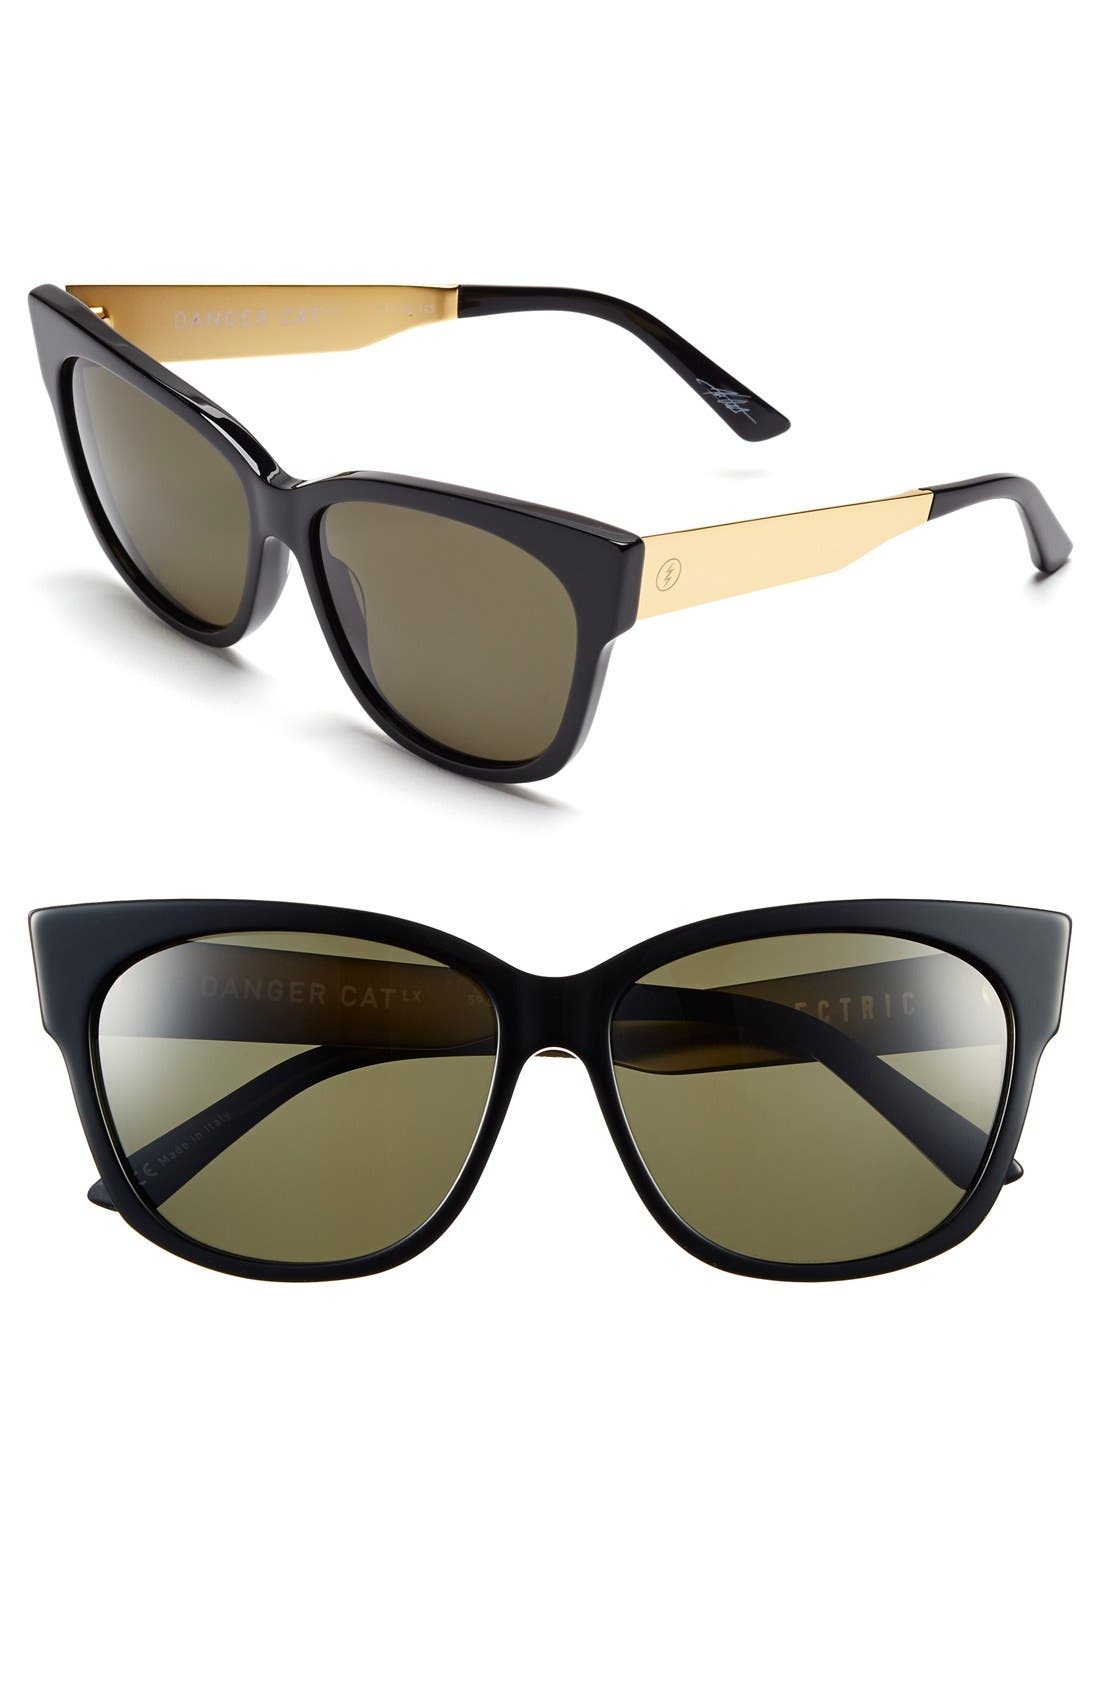 'Danger Cat LX' 59mm Cat Eye Sunglasses,                         Main,                         color, Gloss Black/ Grey